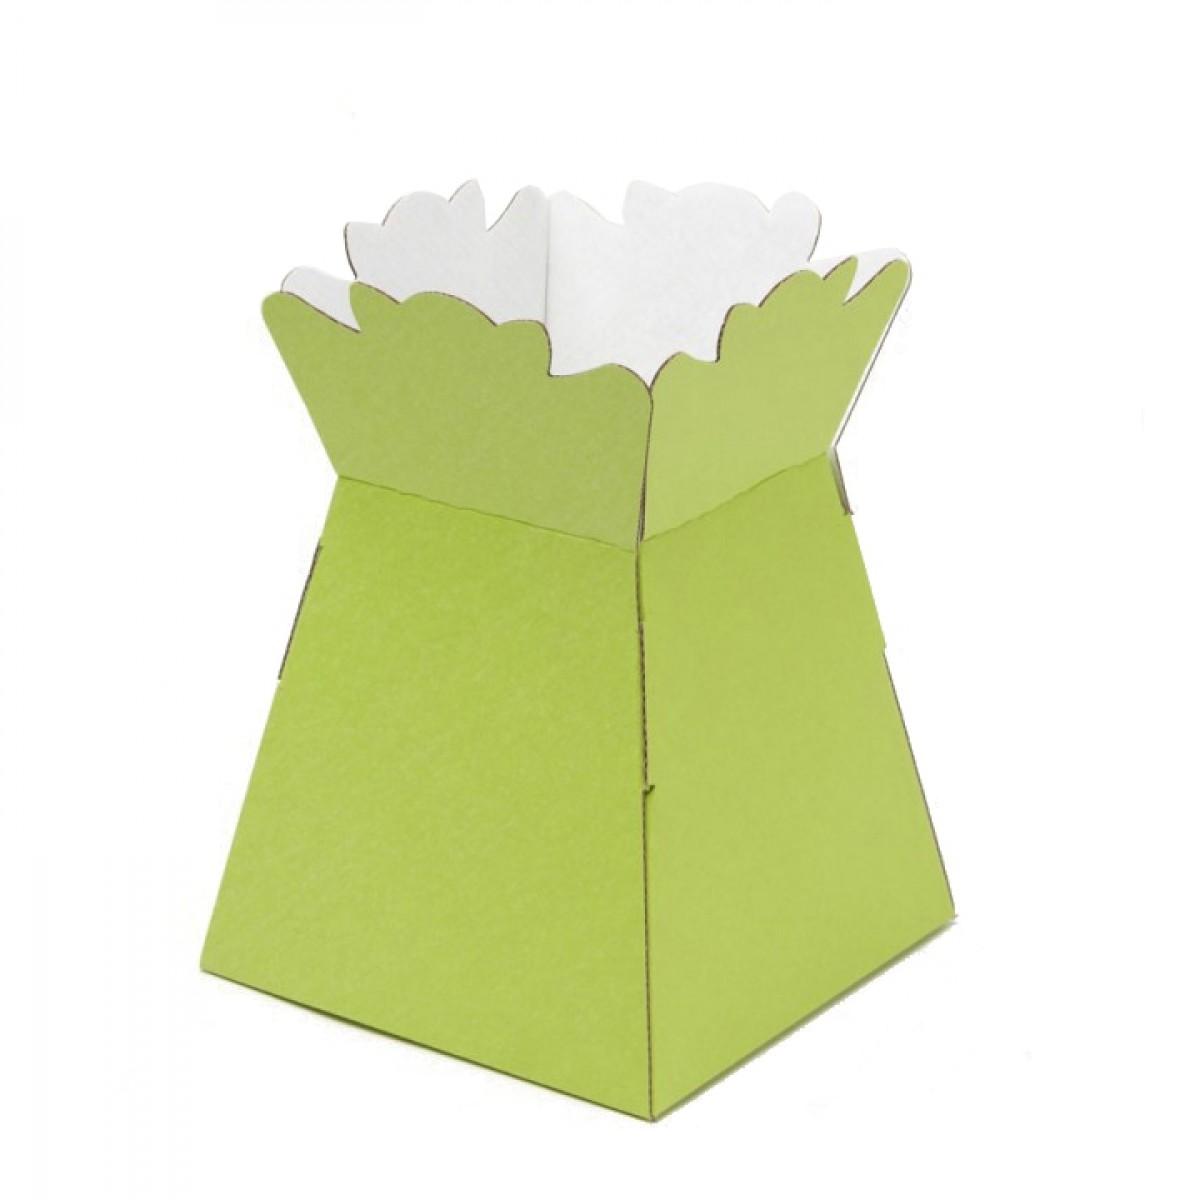 Porto Vase Green 17x24cm - Pack Of 5